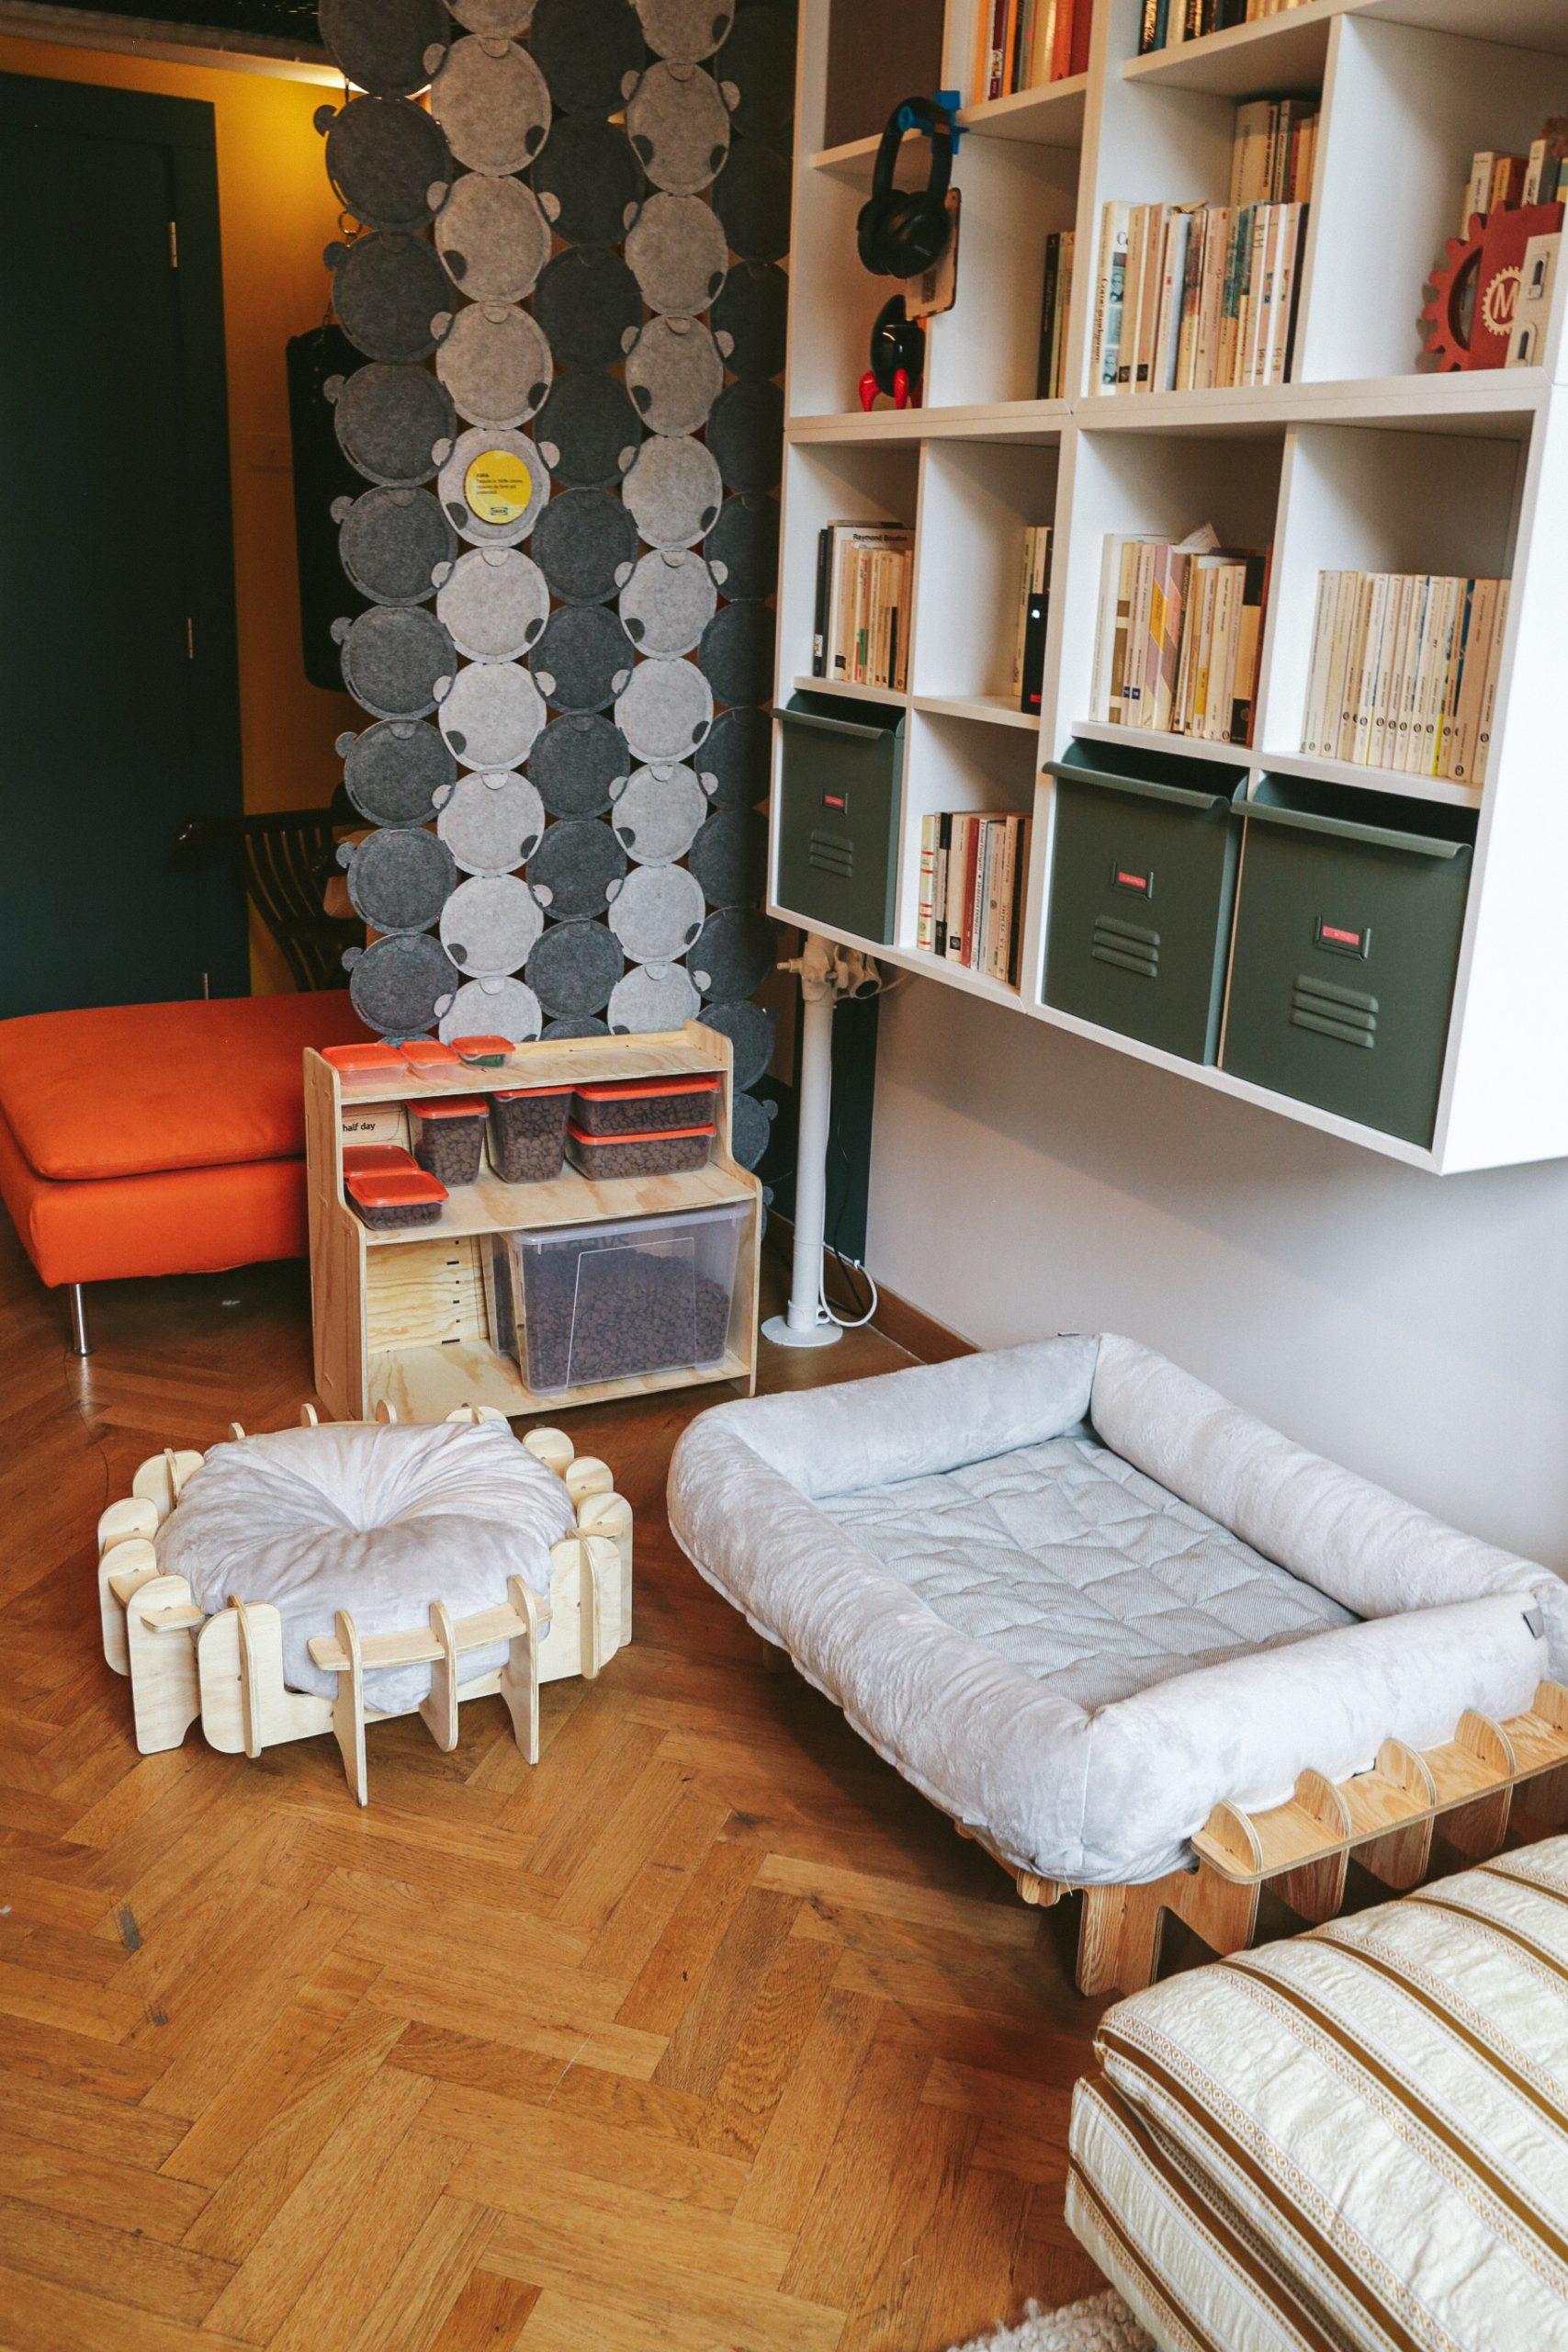 Miocugino IKEA Milano Design Week 2021 cuccia akutcha simanja